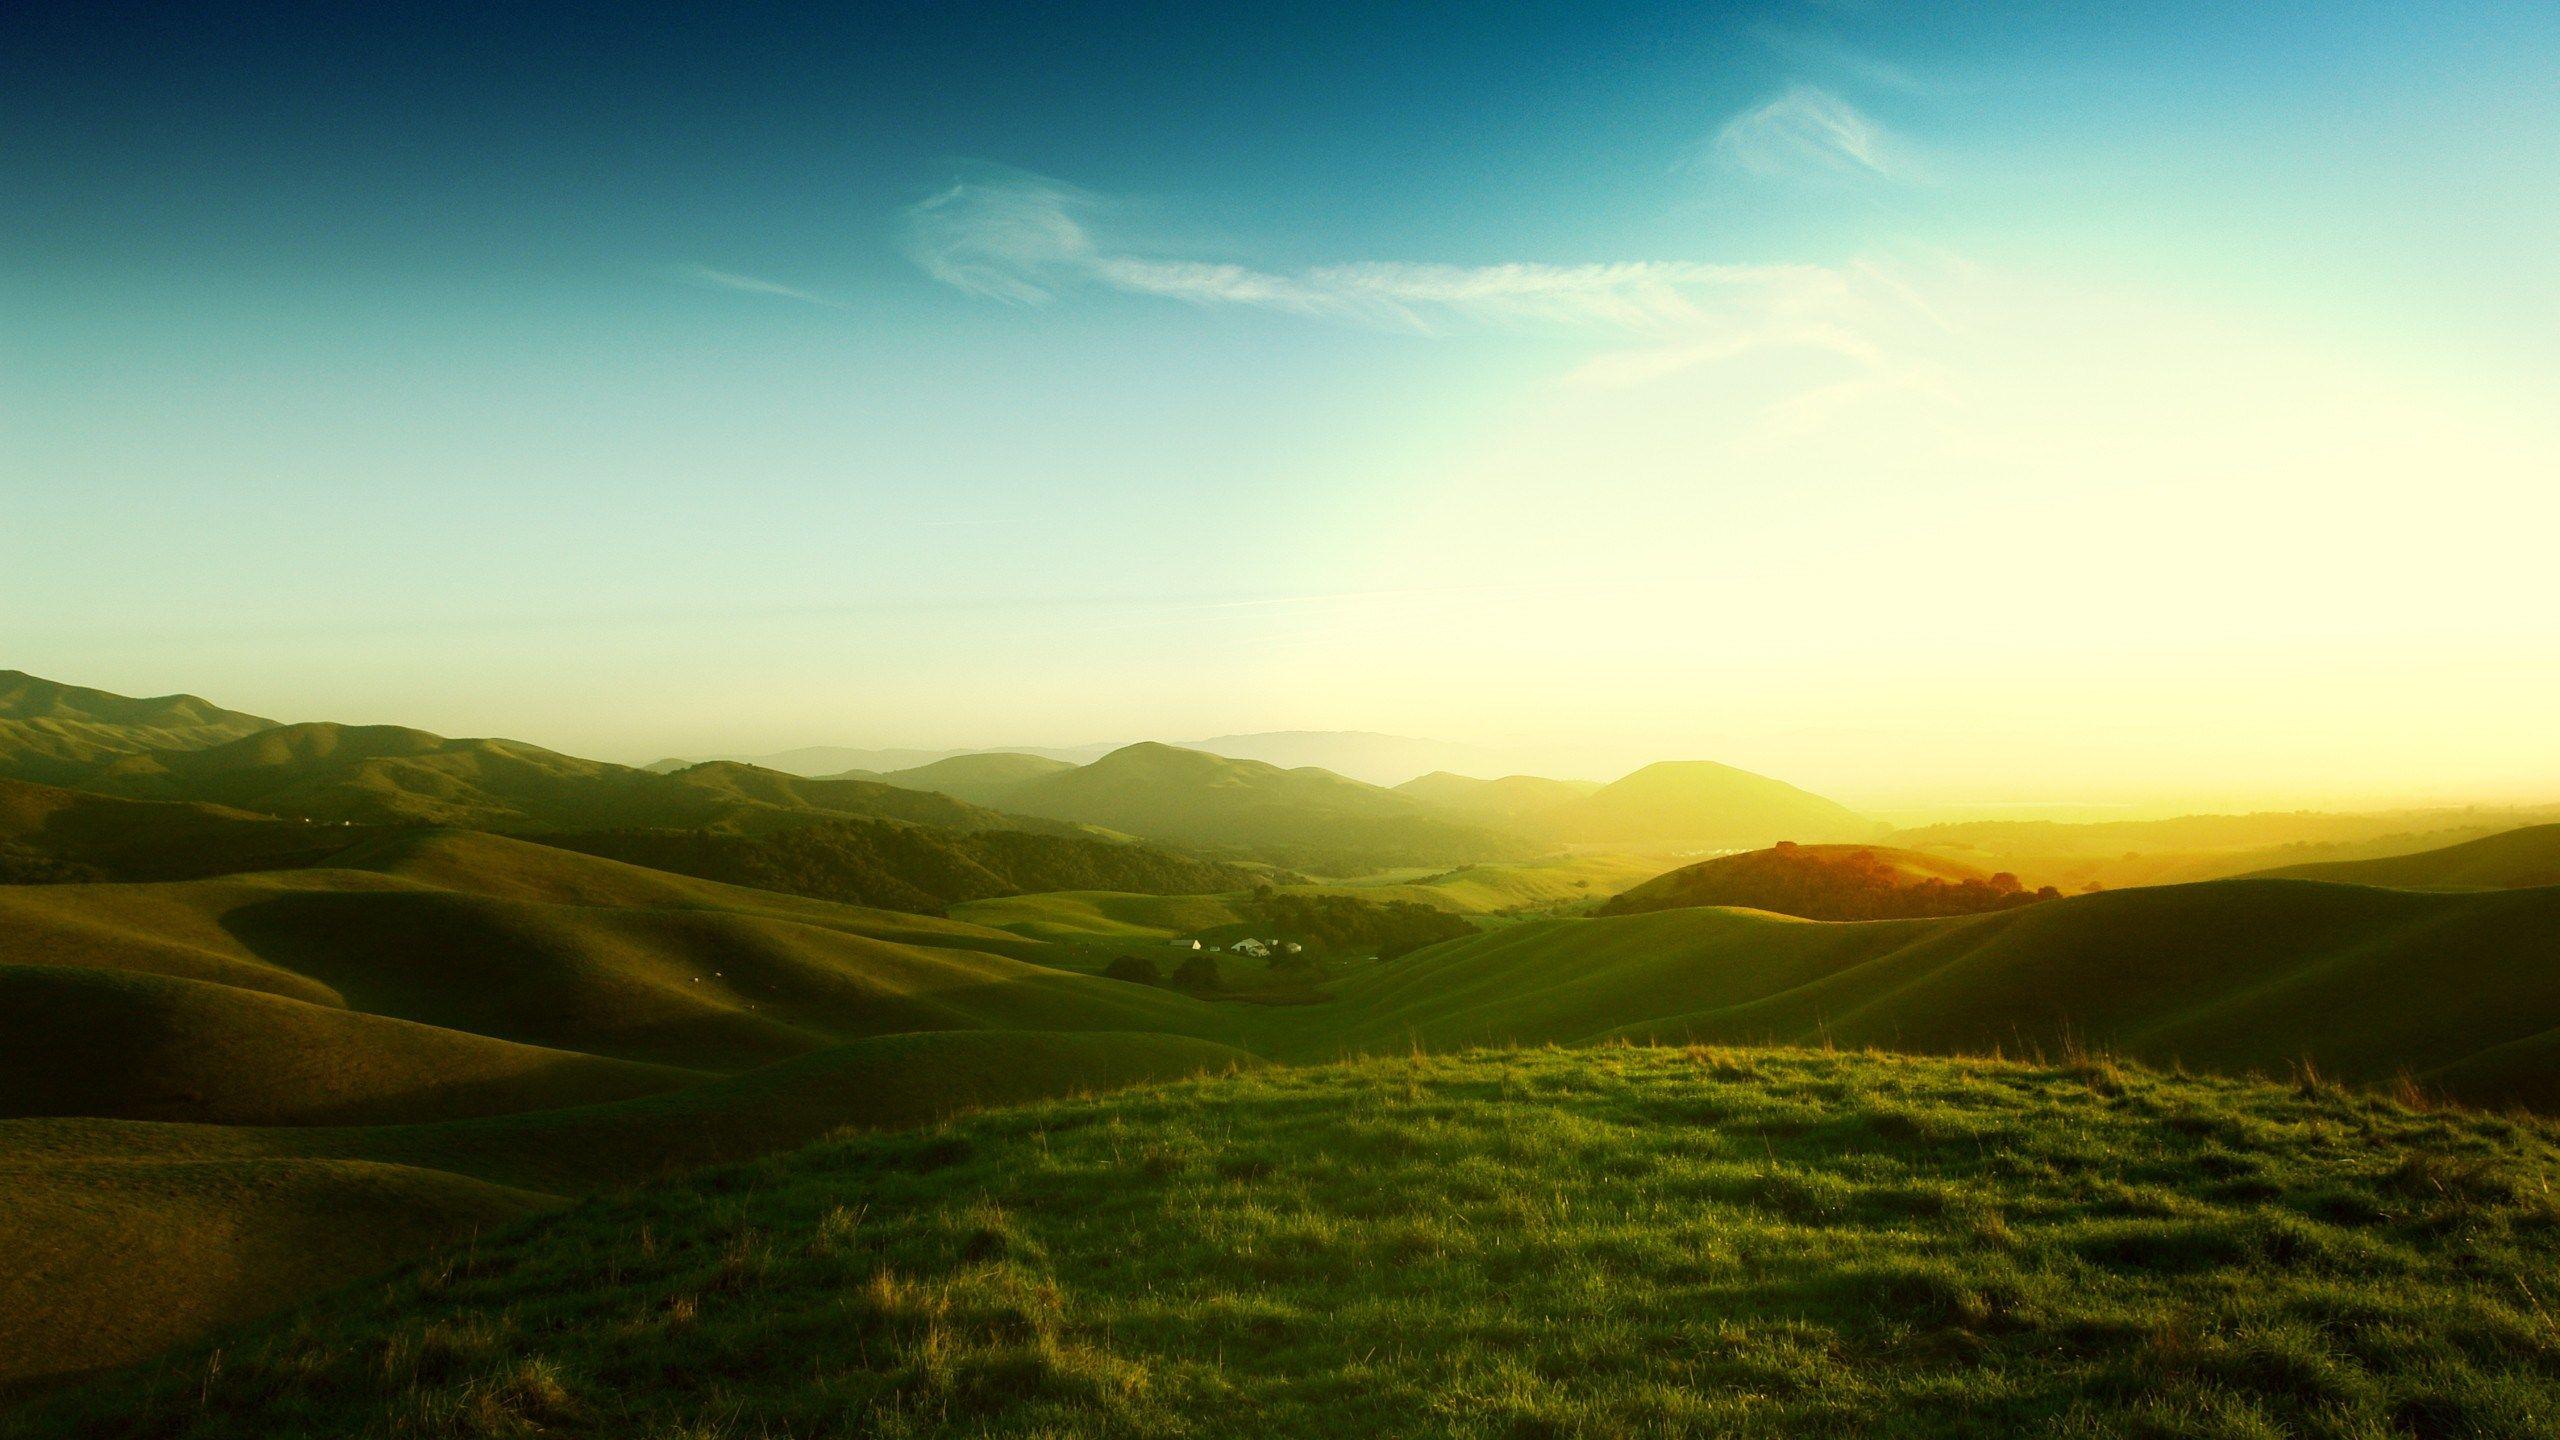 2560x1440 Free Download Landscape Summer Landscape Landscape Wallpaper Scenery